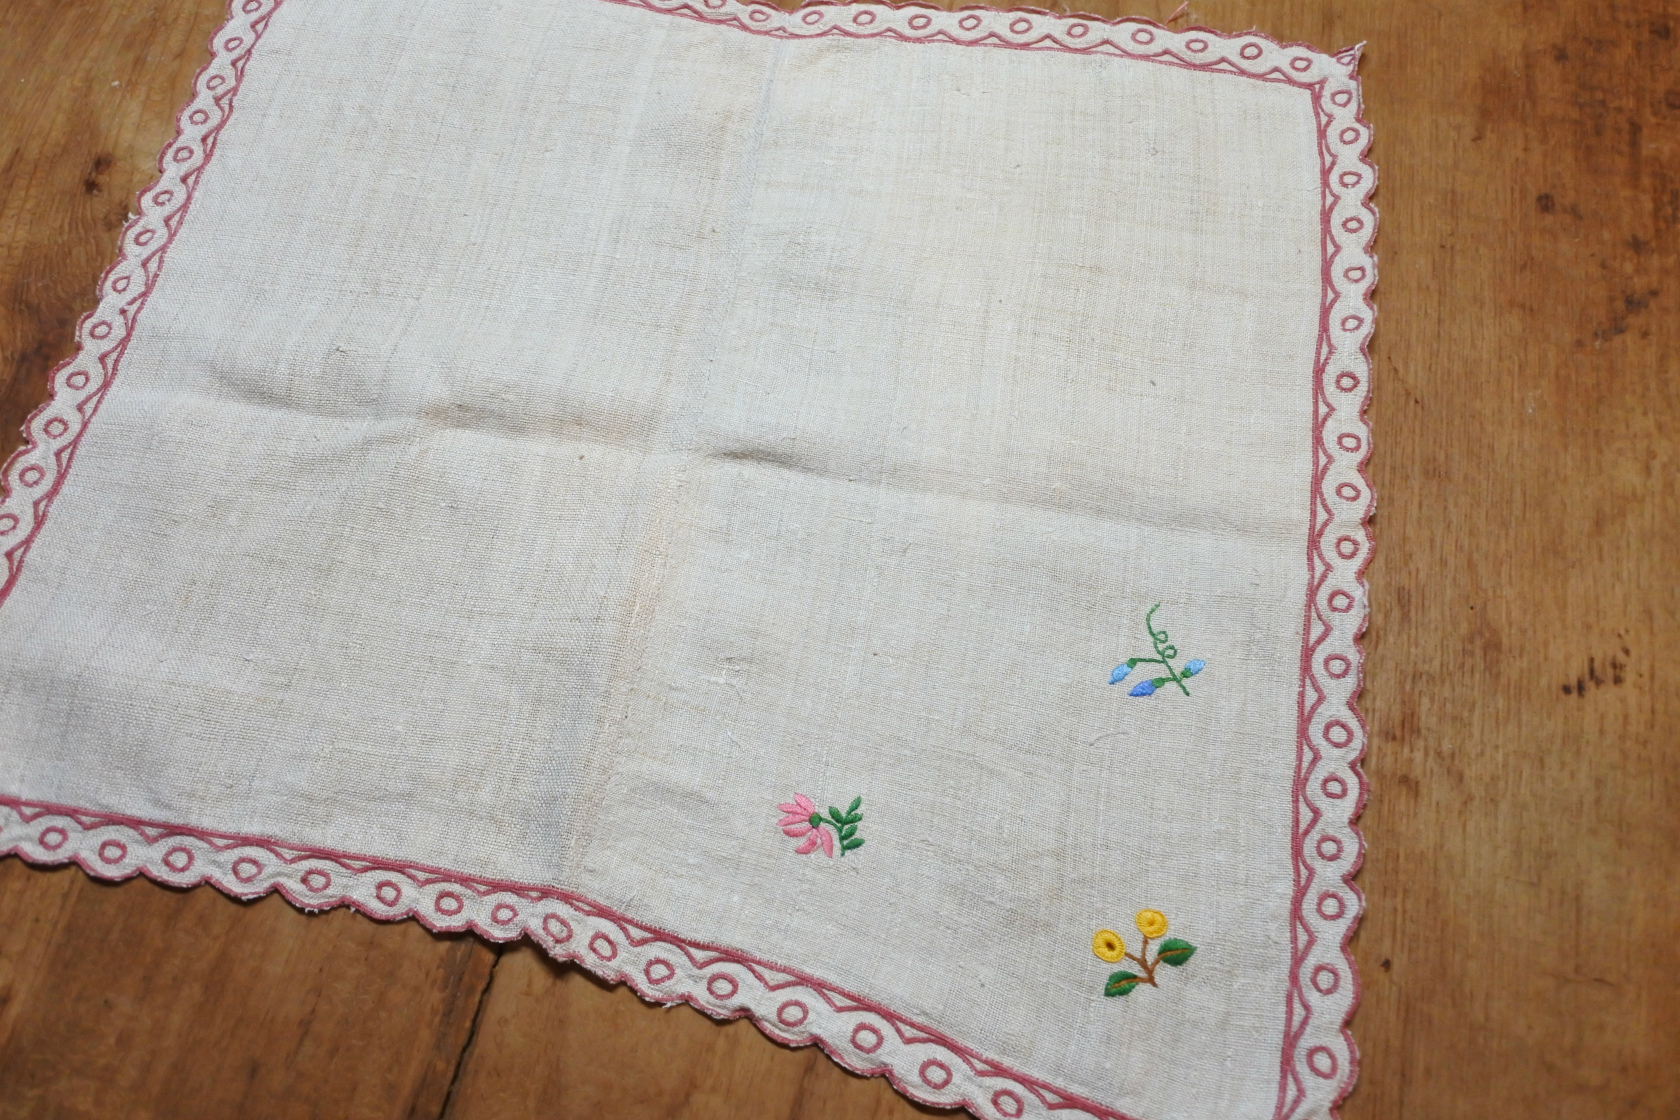 vi-fr-embroiderednapkin-a